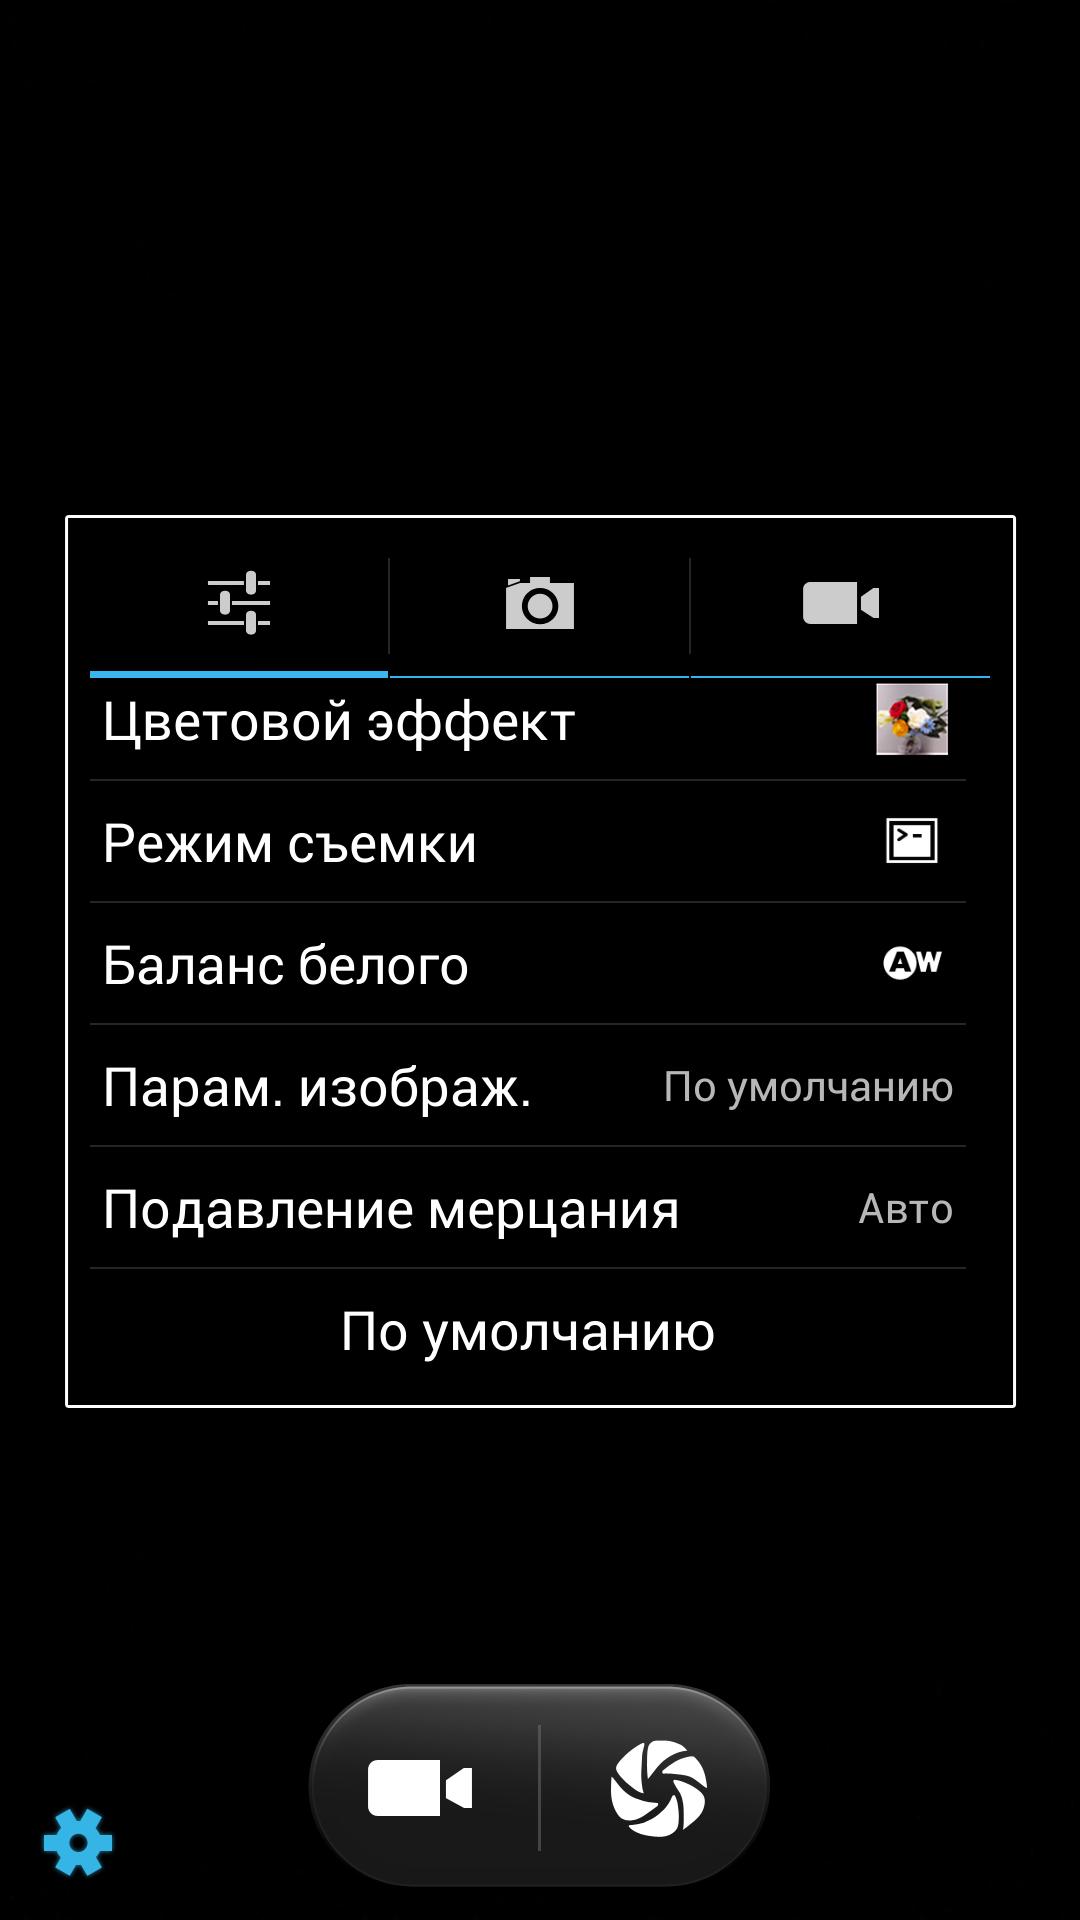 Screenshot_2014-07-11-19-59-41